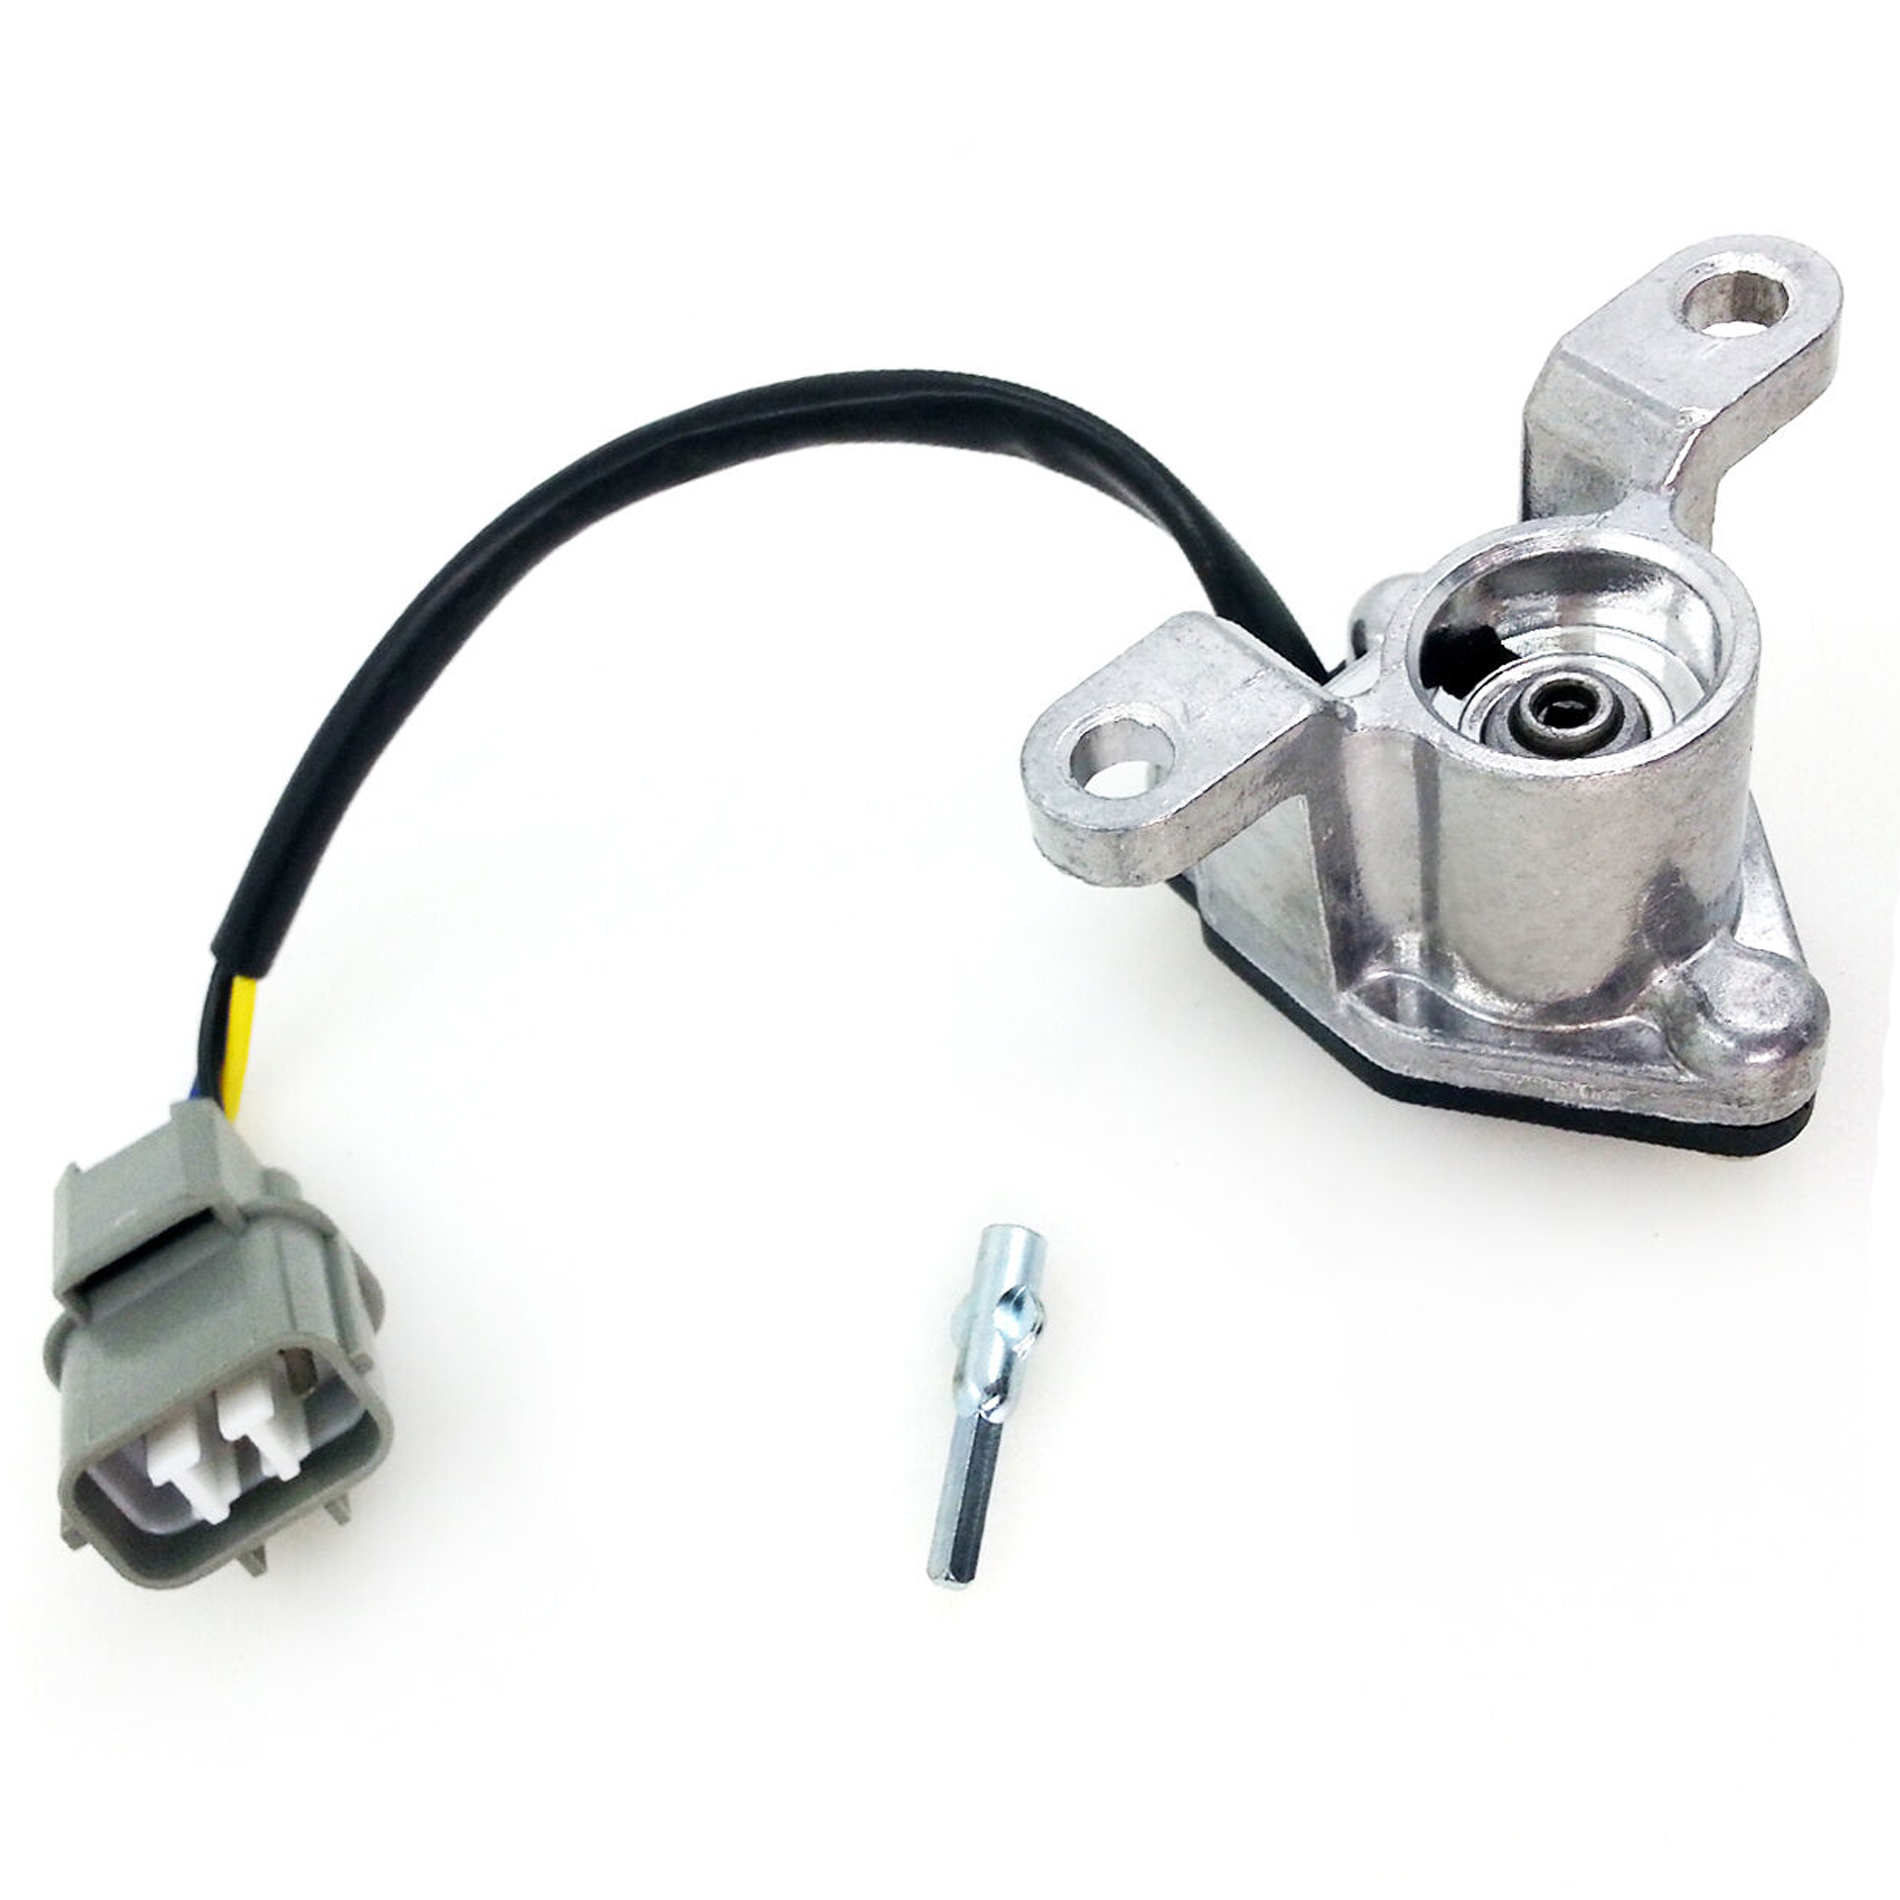 Speed Sensor B838 78410SY0003 For Honda Accord Prelude 2.2L